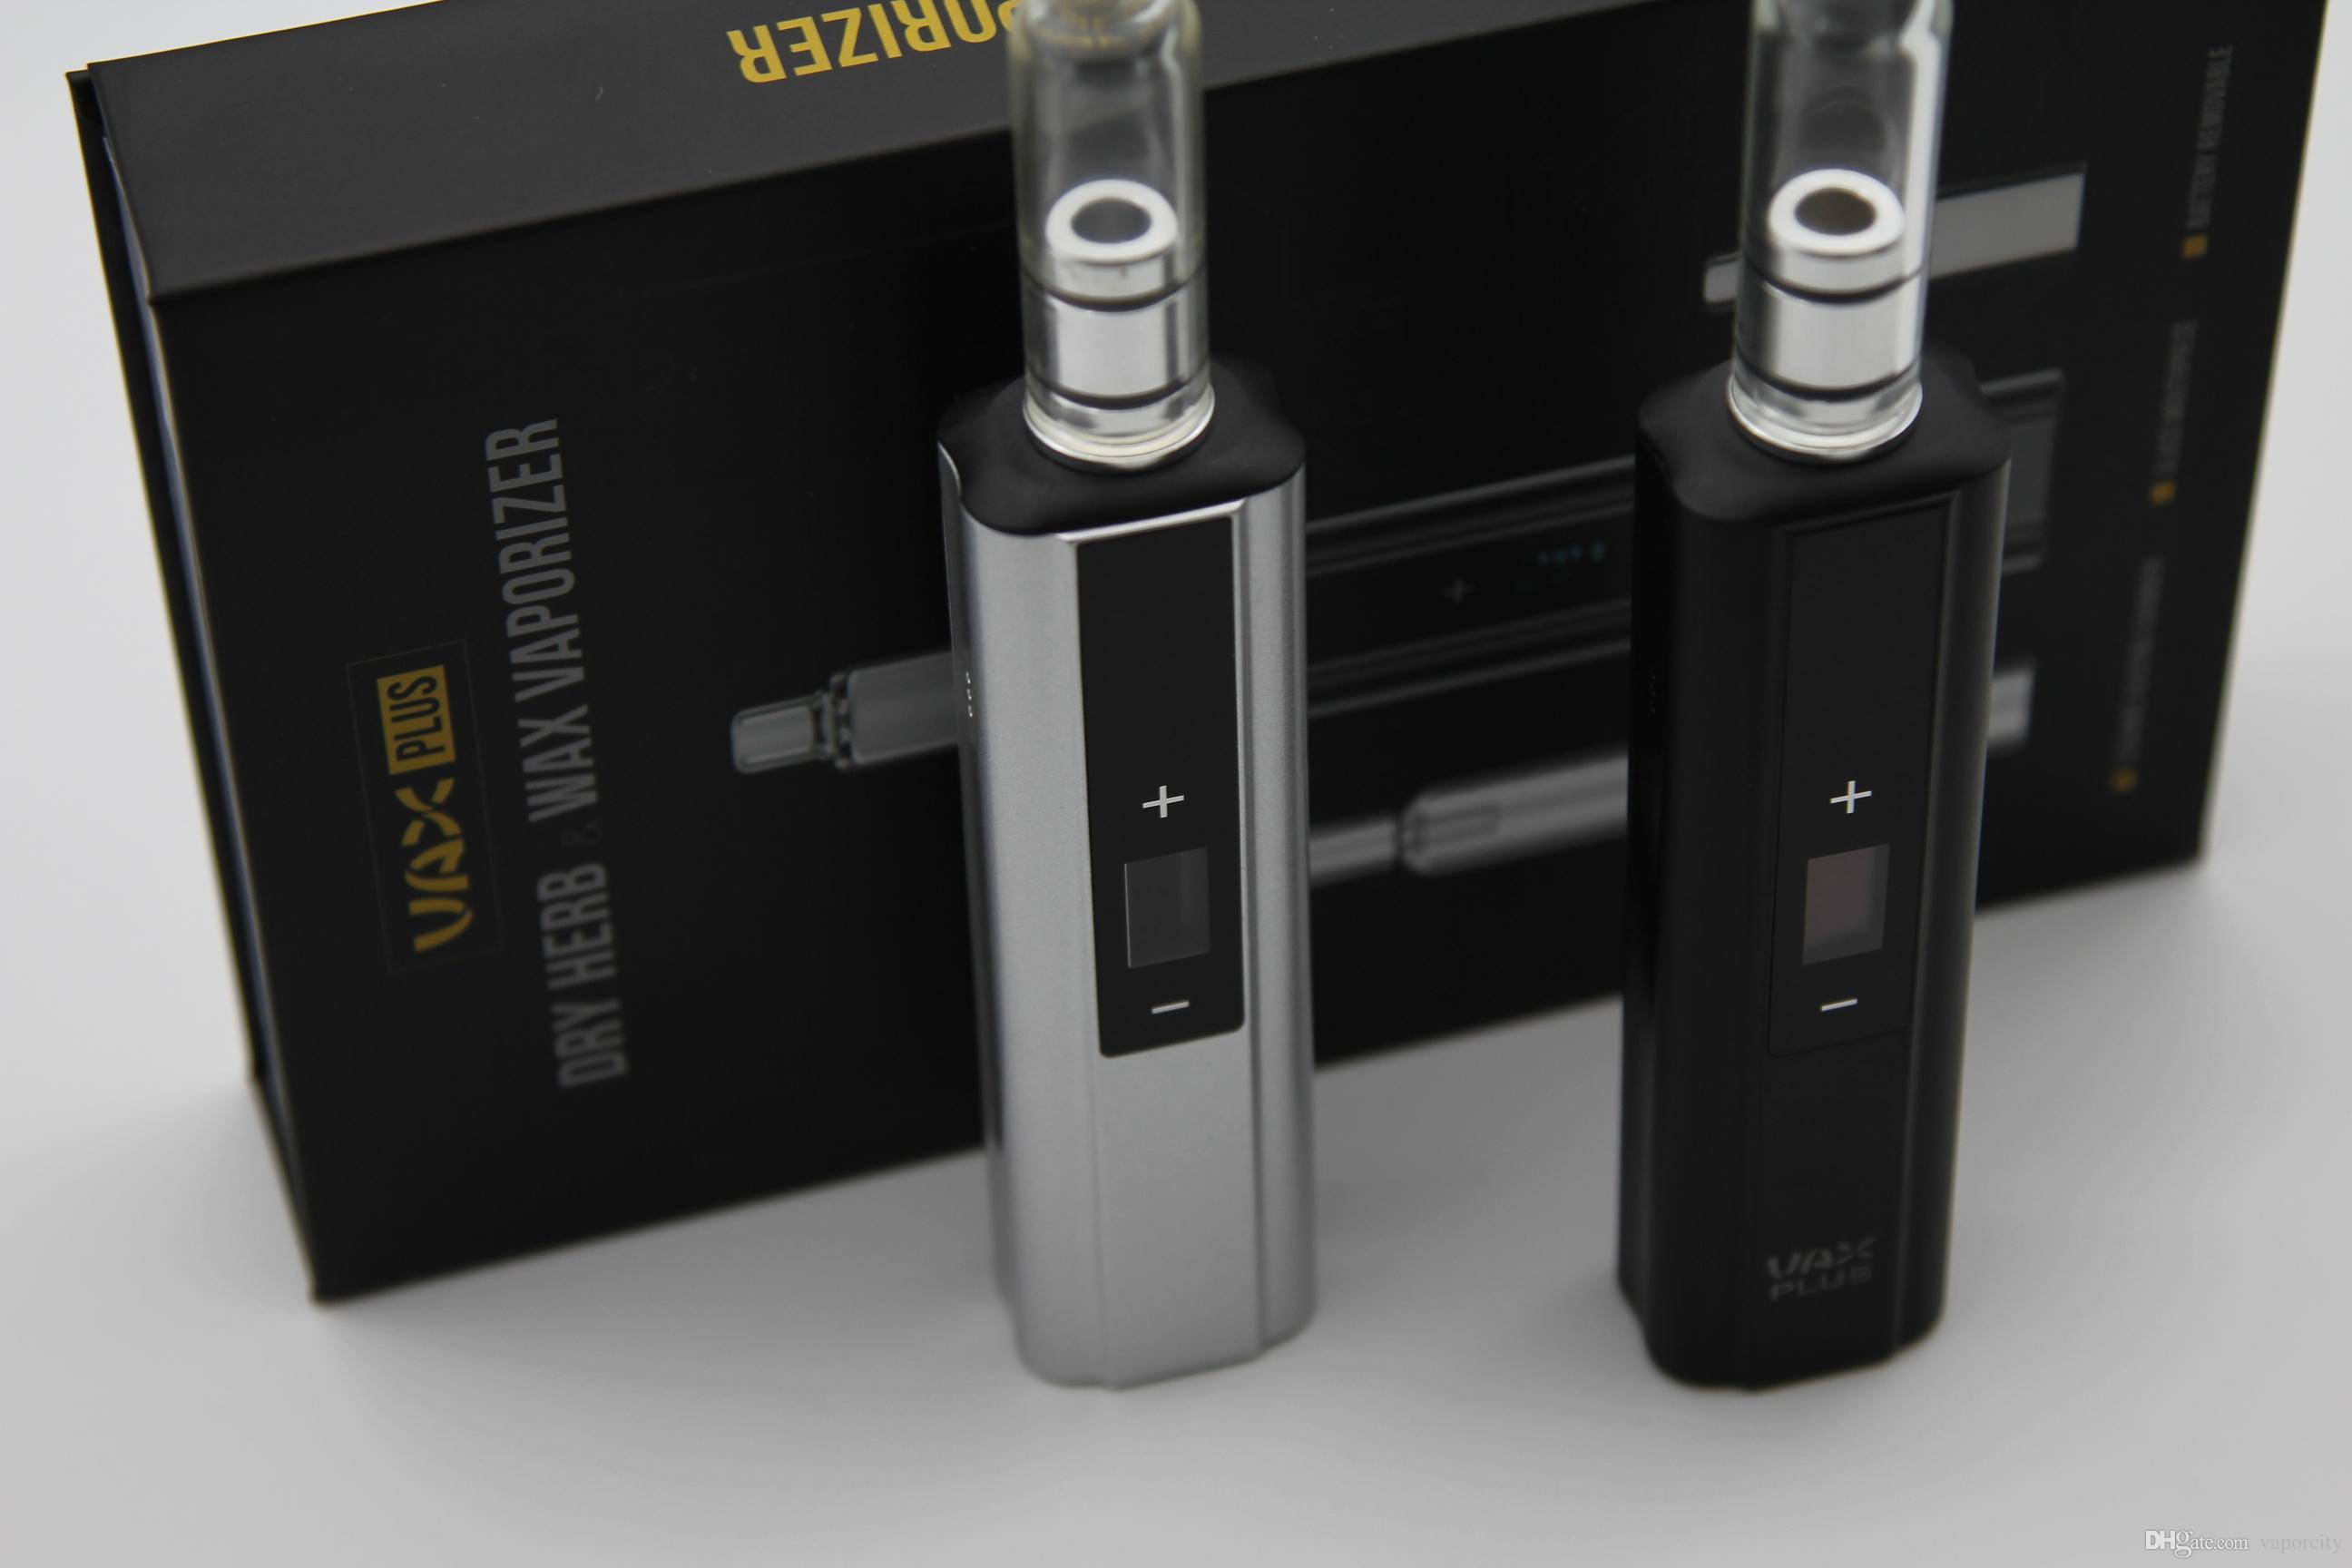 Patented Vax plus kit Dry Herb ecig wax herbal vaporizer kits 3000mah battery oled screen vaporizer vs vax mini air elite mighty